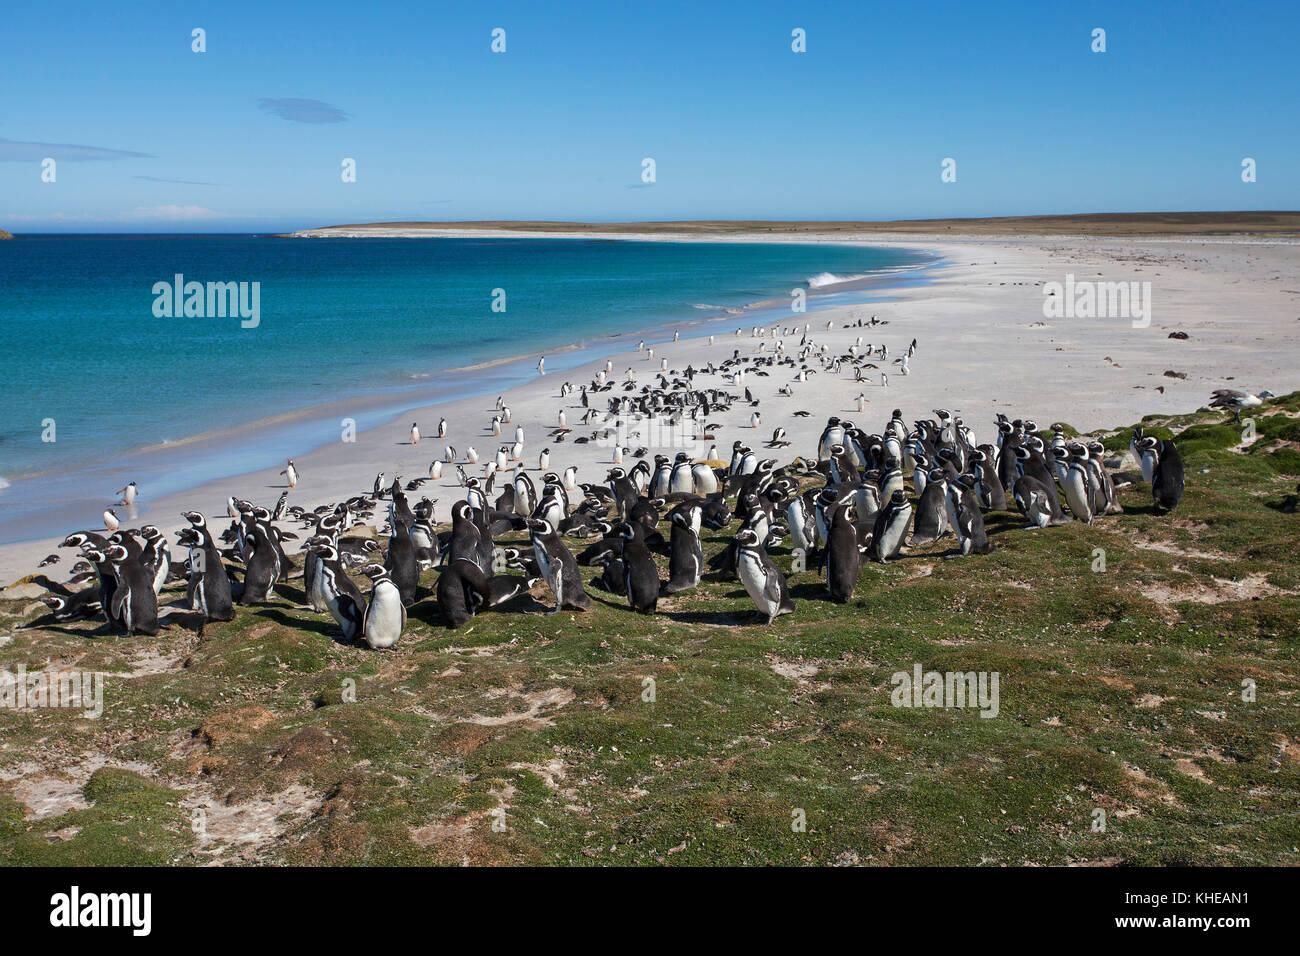 Magellanic penguin Spheniscus magellanicus adults along shoreline of a bay Bleaker Island Falkland Islands British Overseas Territory December 2016 Stock Photo